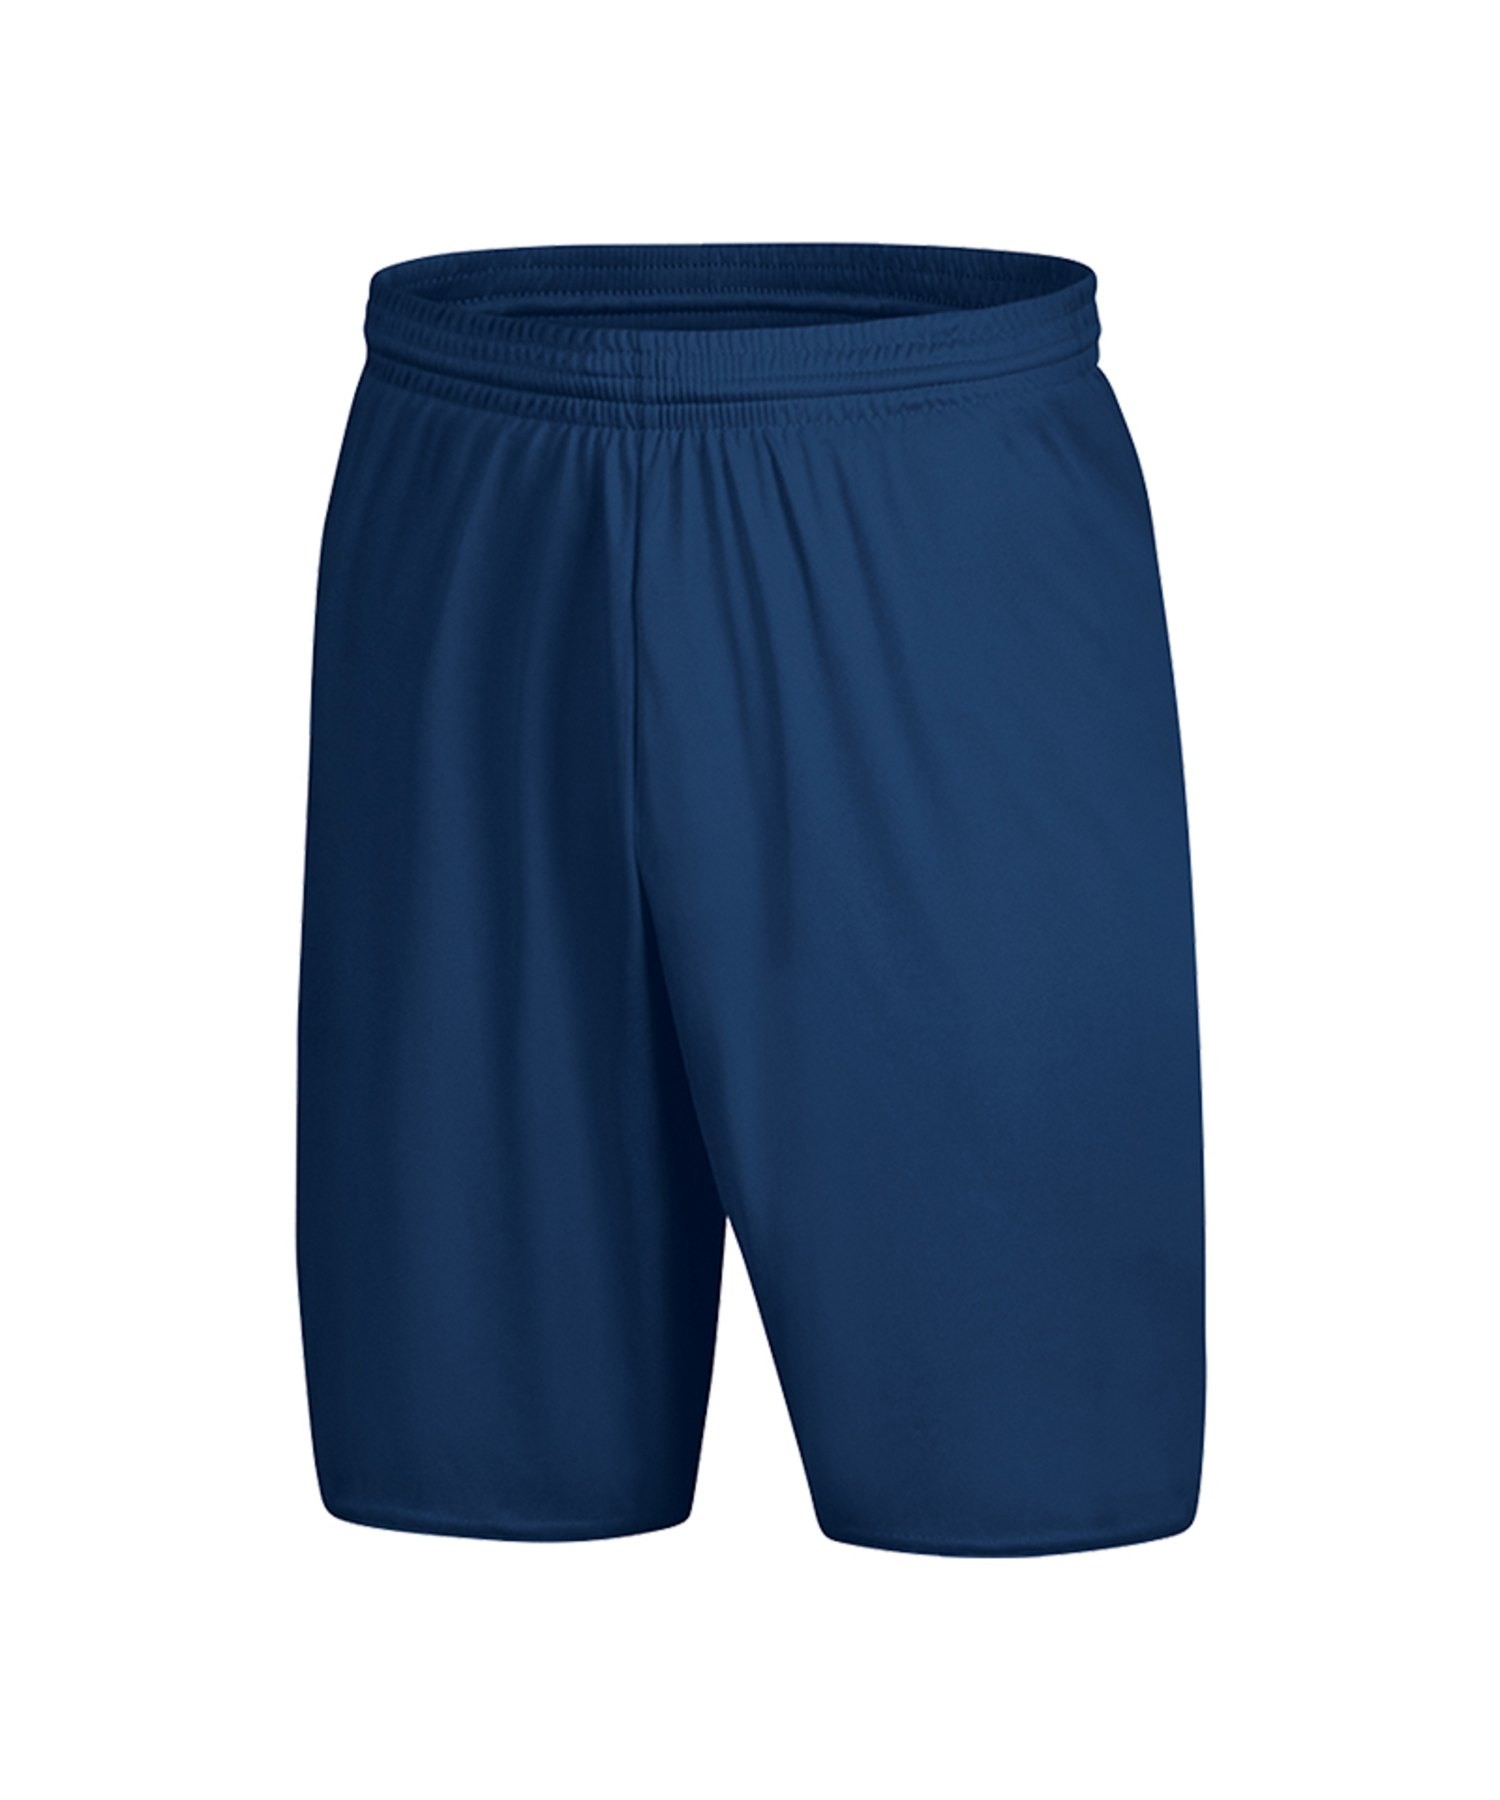 Jako Palermo 2.0 Short Hose kurz Blau F09 - Blau